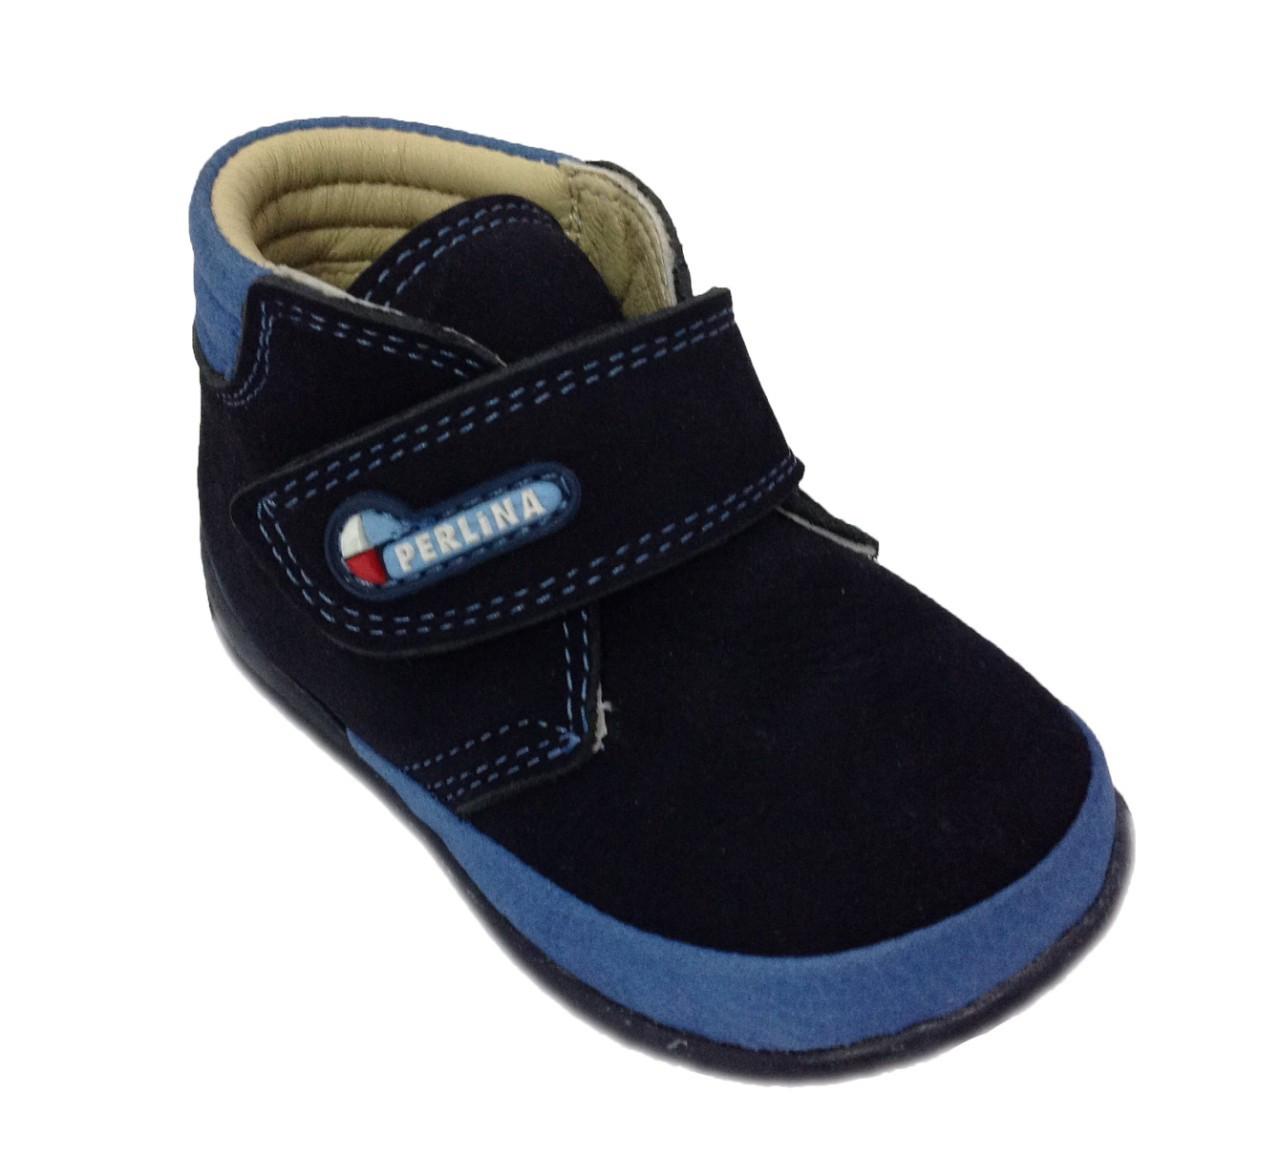 Ботинки Perlina 95BLUE1LIP Синий